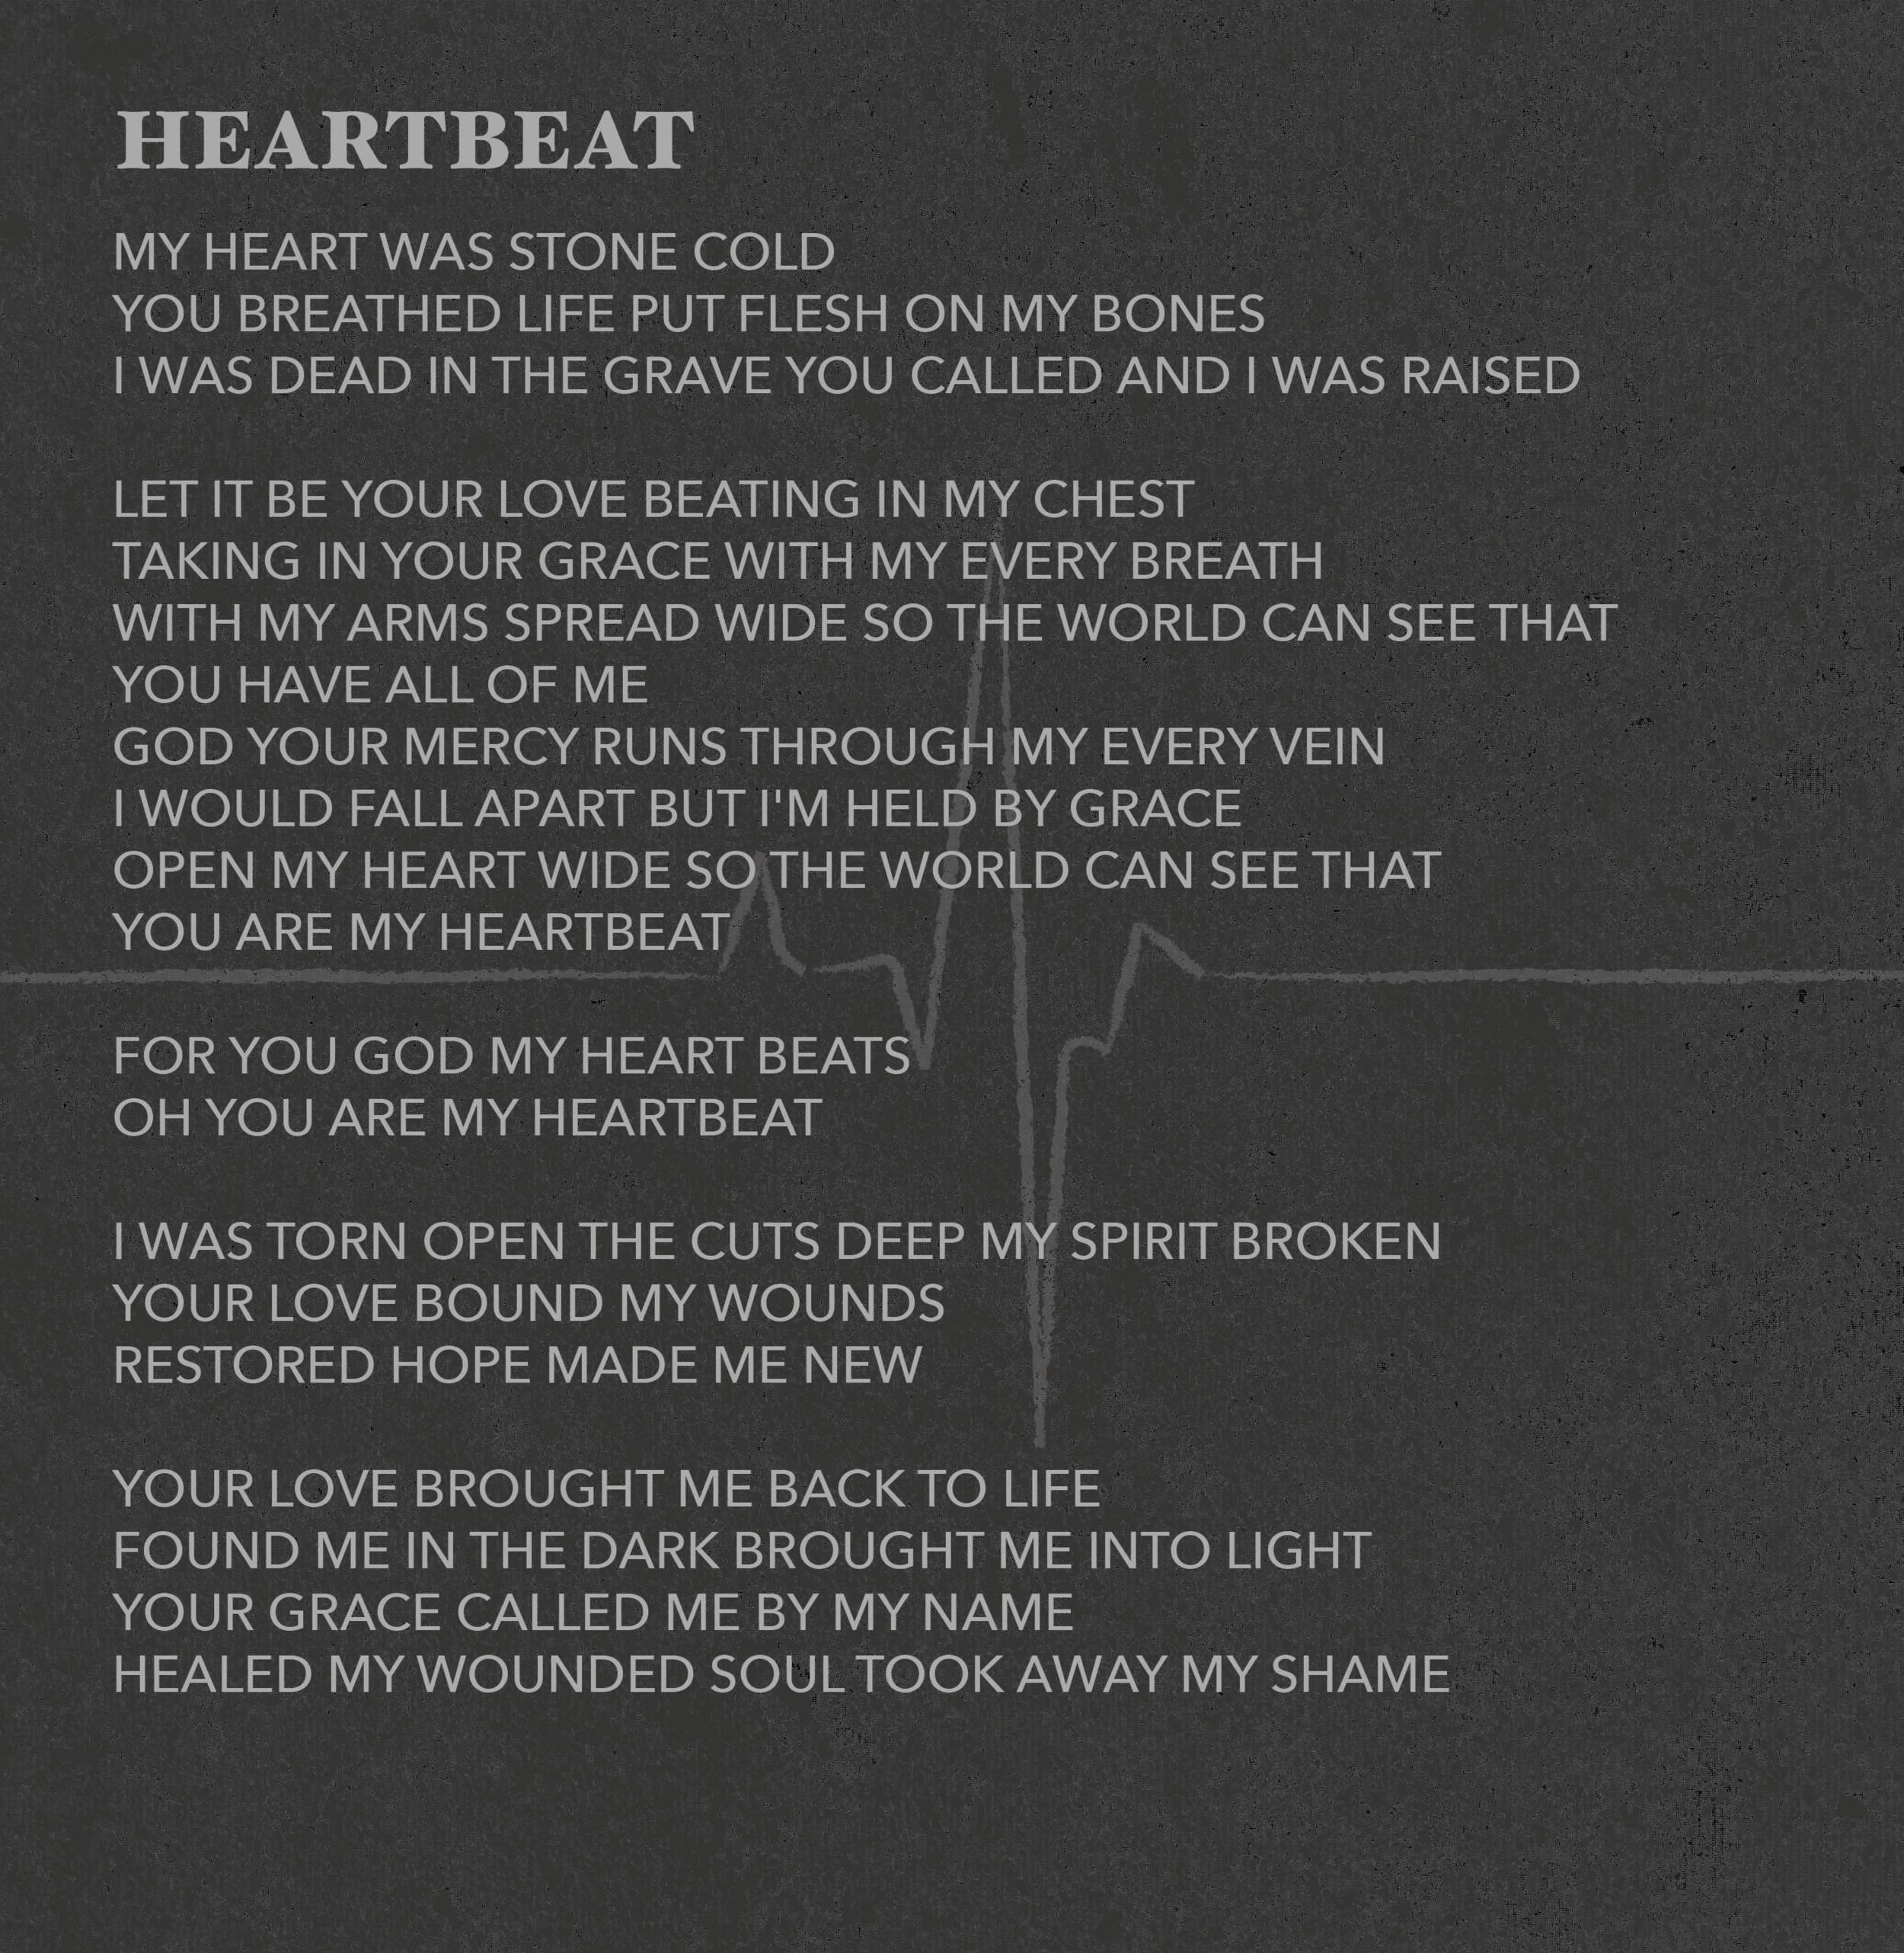 HEARTBEAT_Heartbeat-01.png